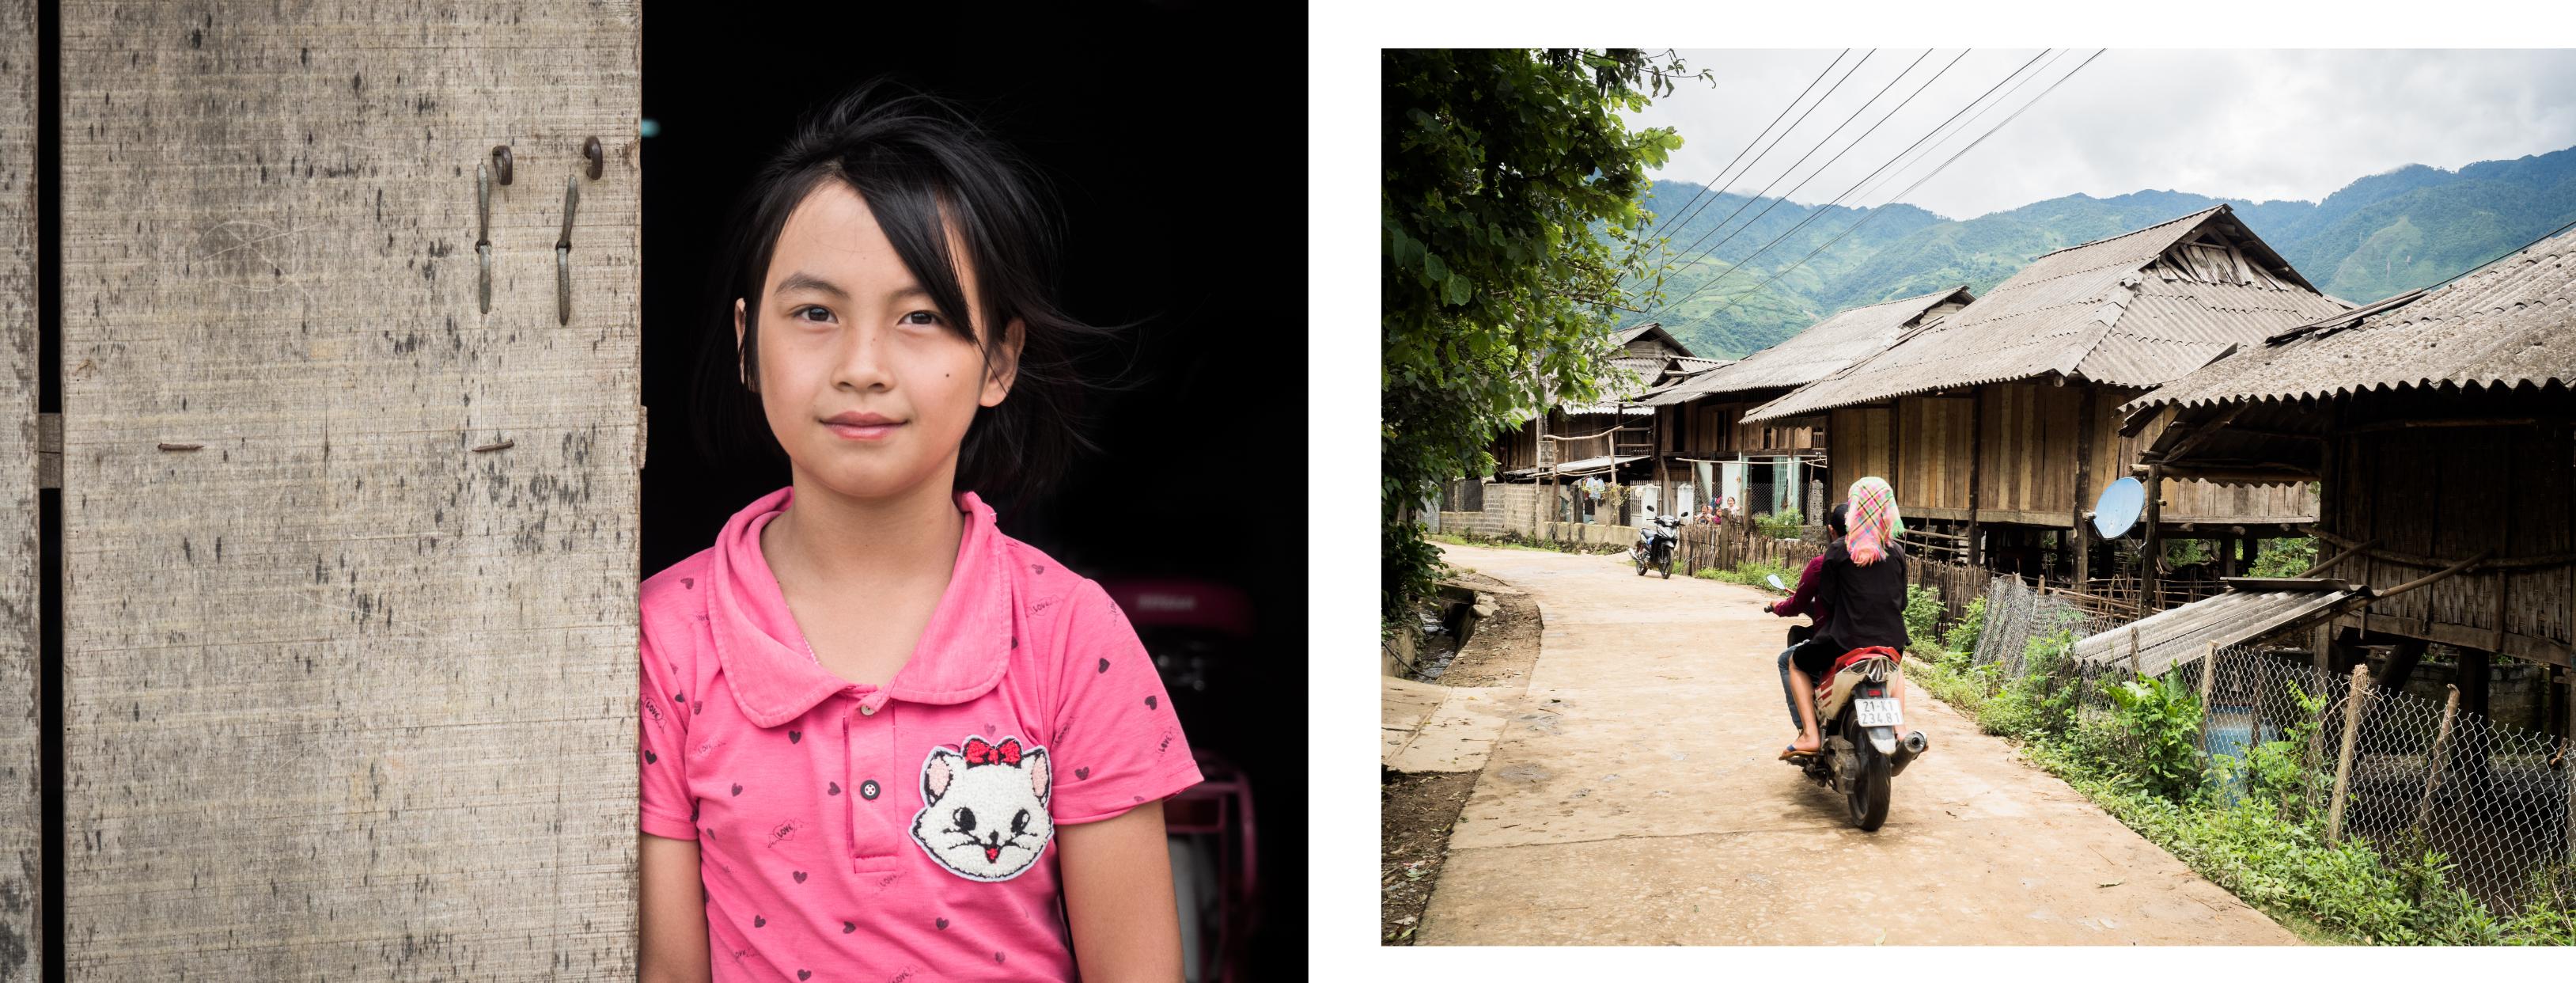 vietnam - ethnies minoritaire - portrait-rizières